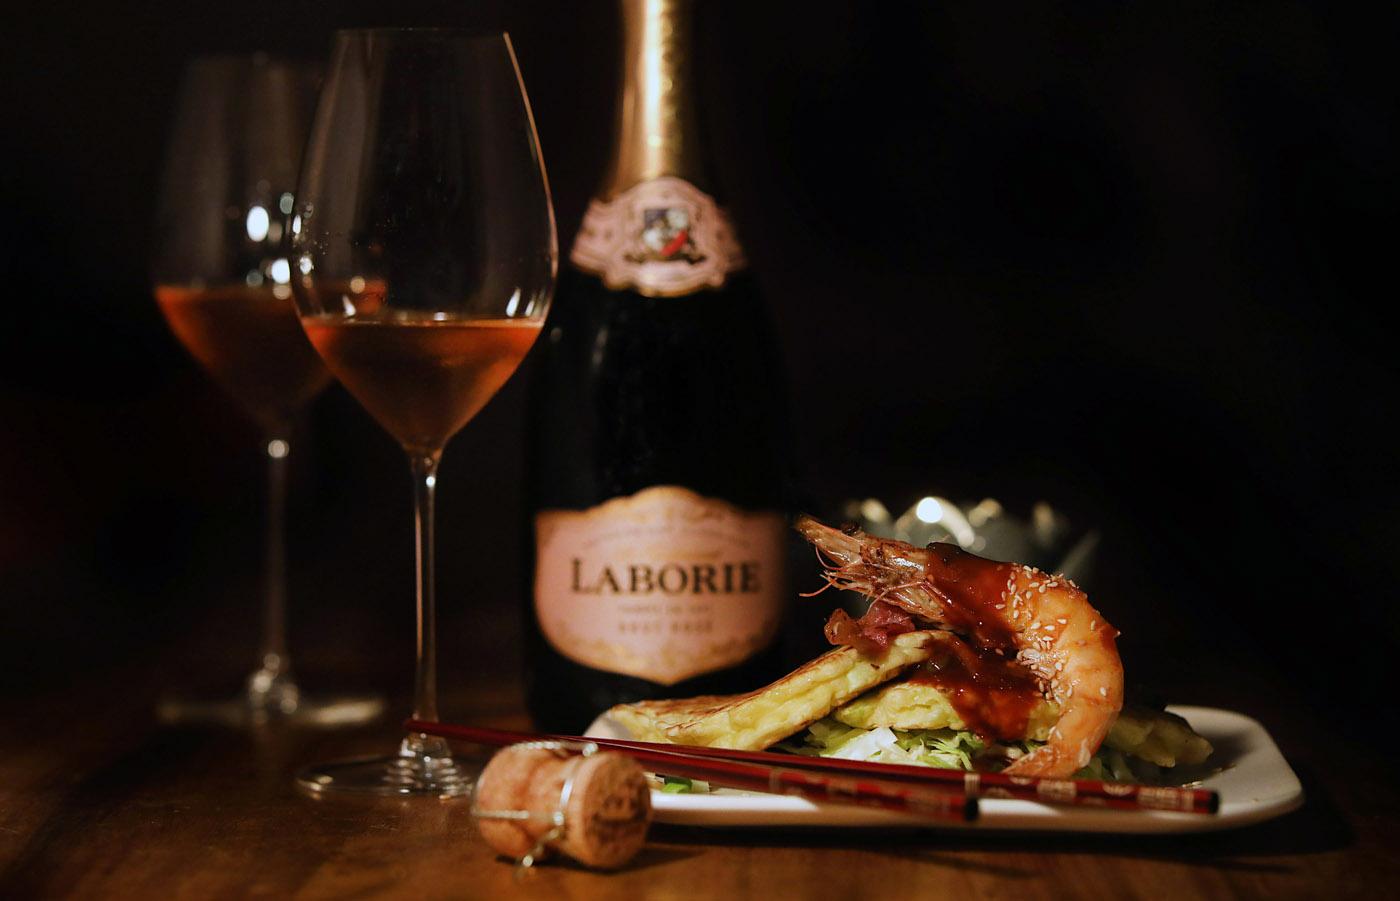 Laborie Date Night